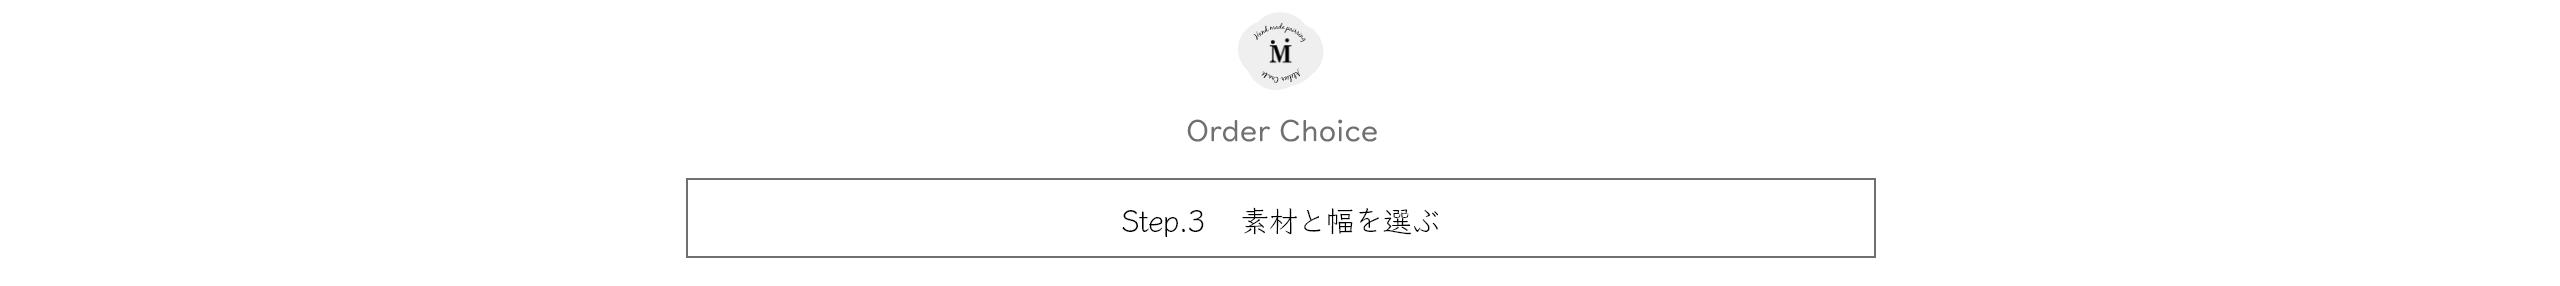 Step.3 素材と幅を選ぶ